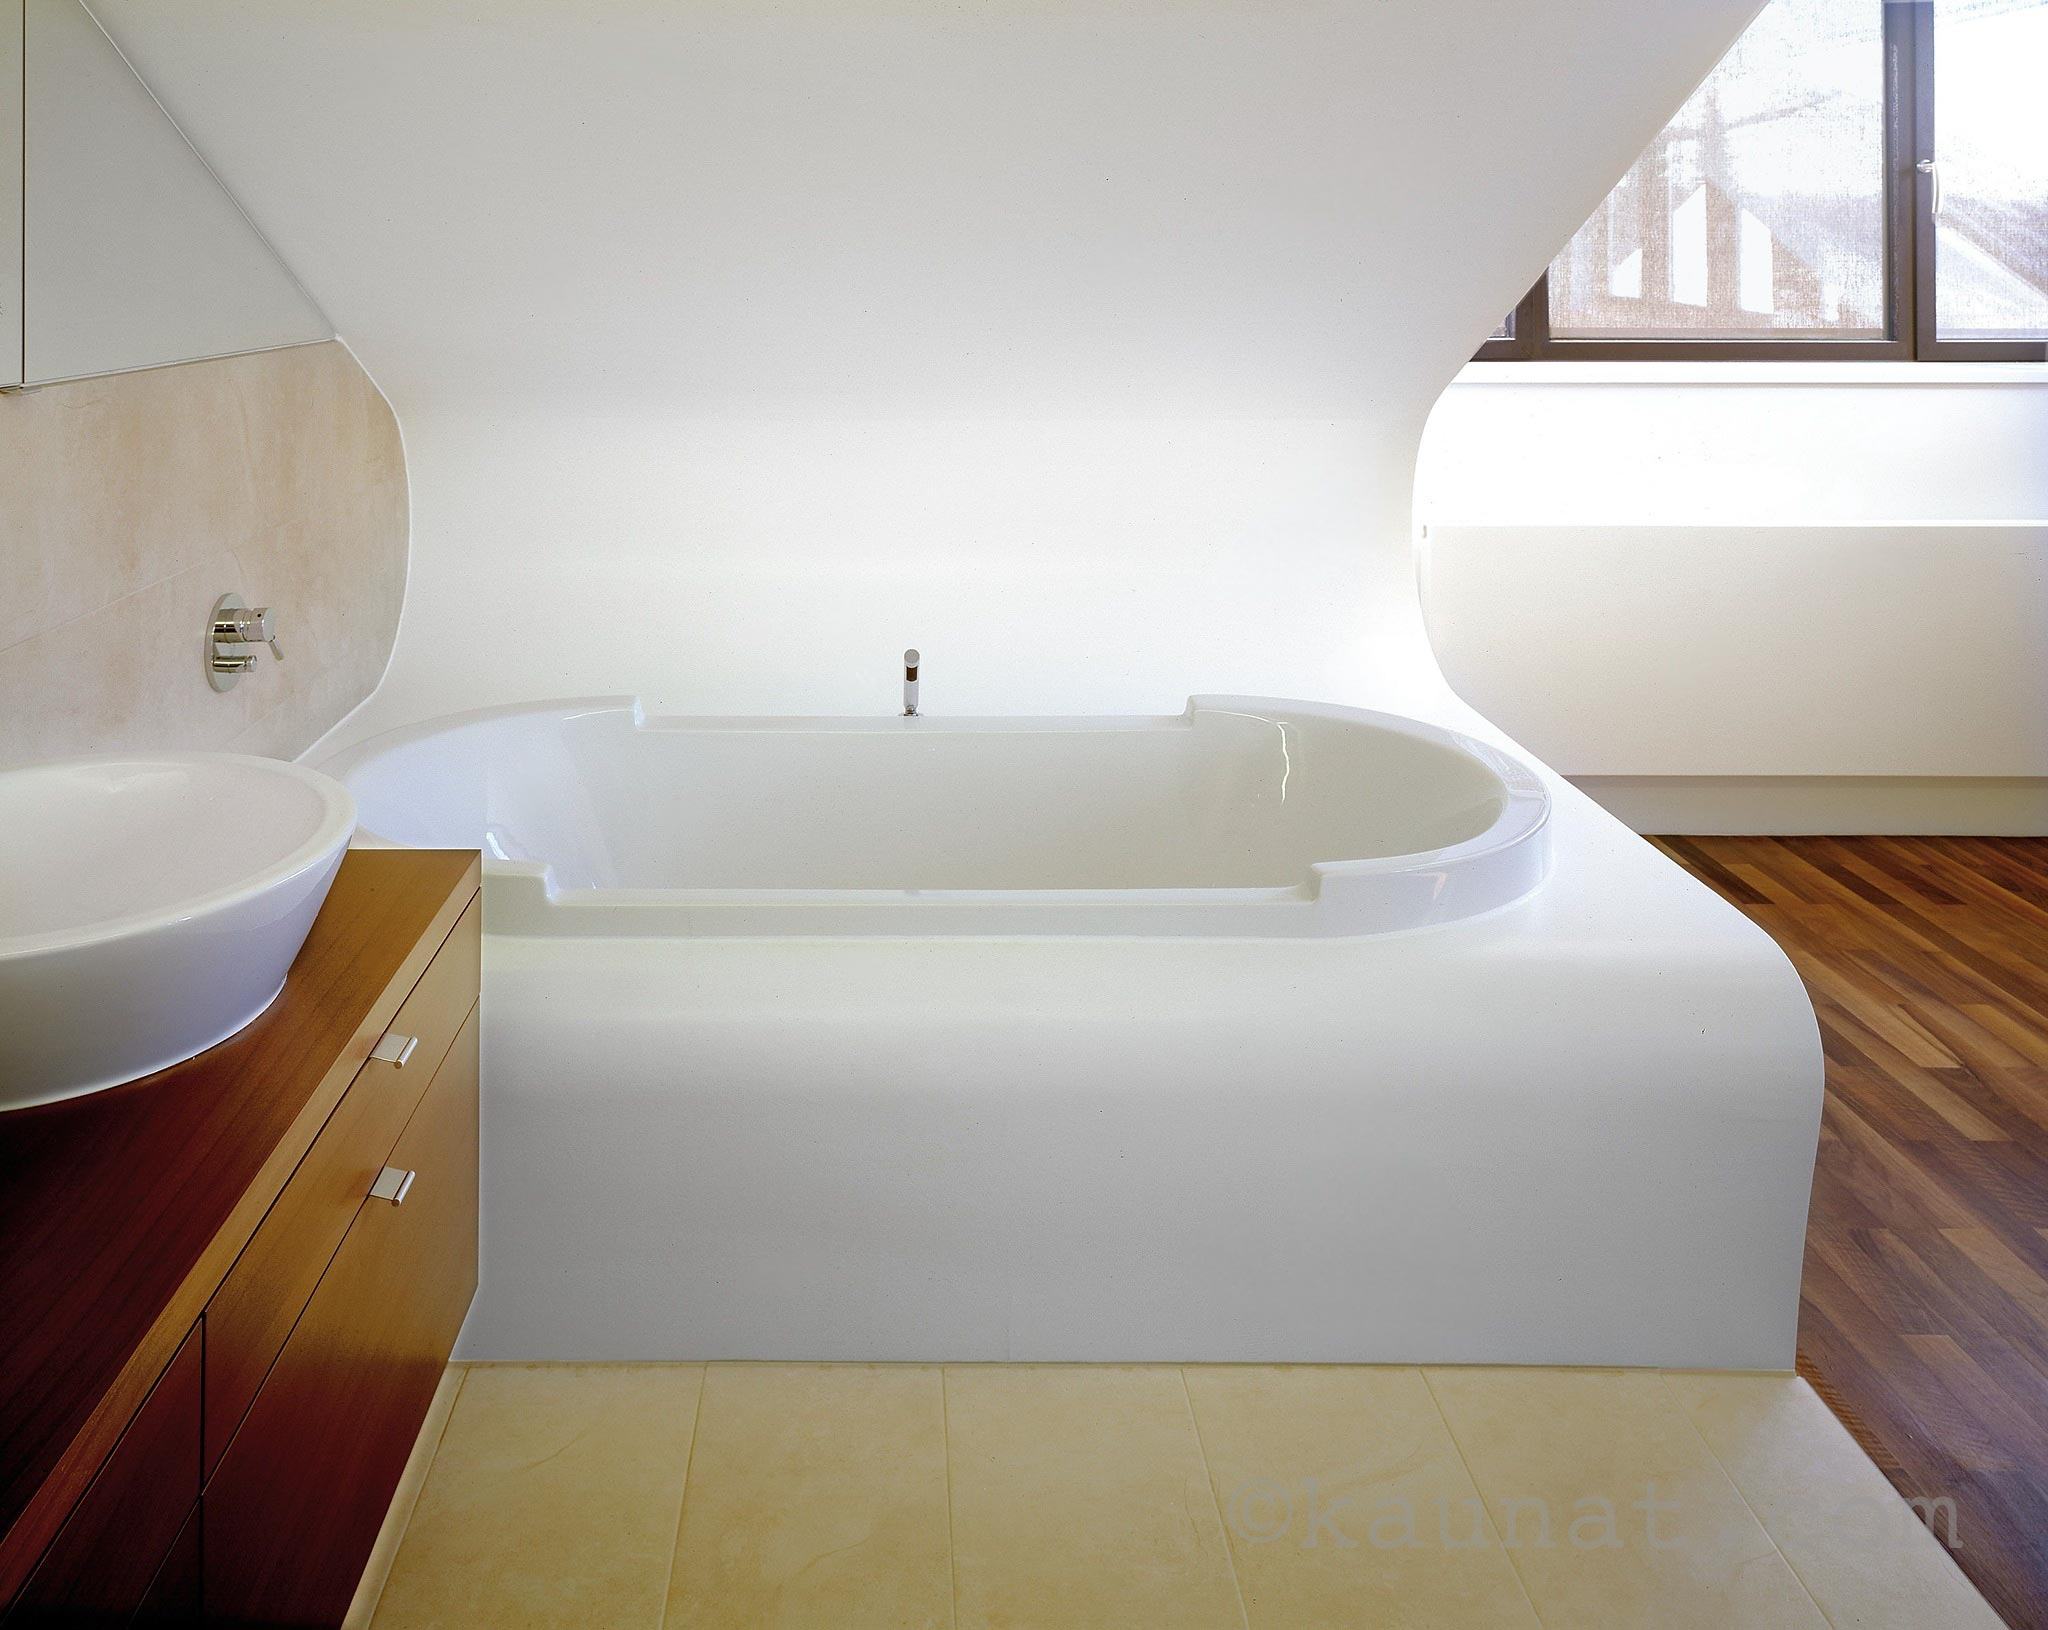 Funvit.com | Welche Farbe Passt Zu Grauen Möbeln Offenes Badezimmer Im Dachgeschoss